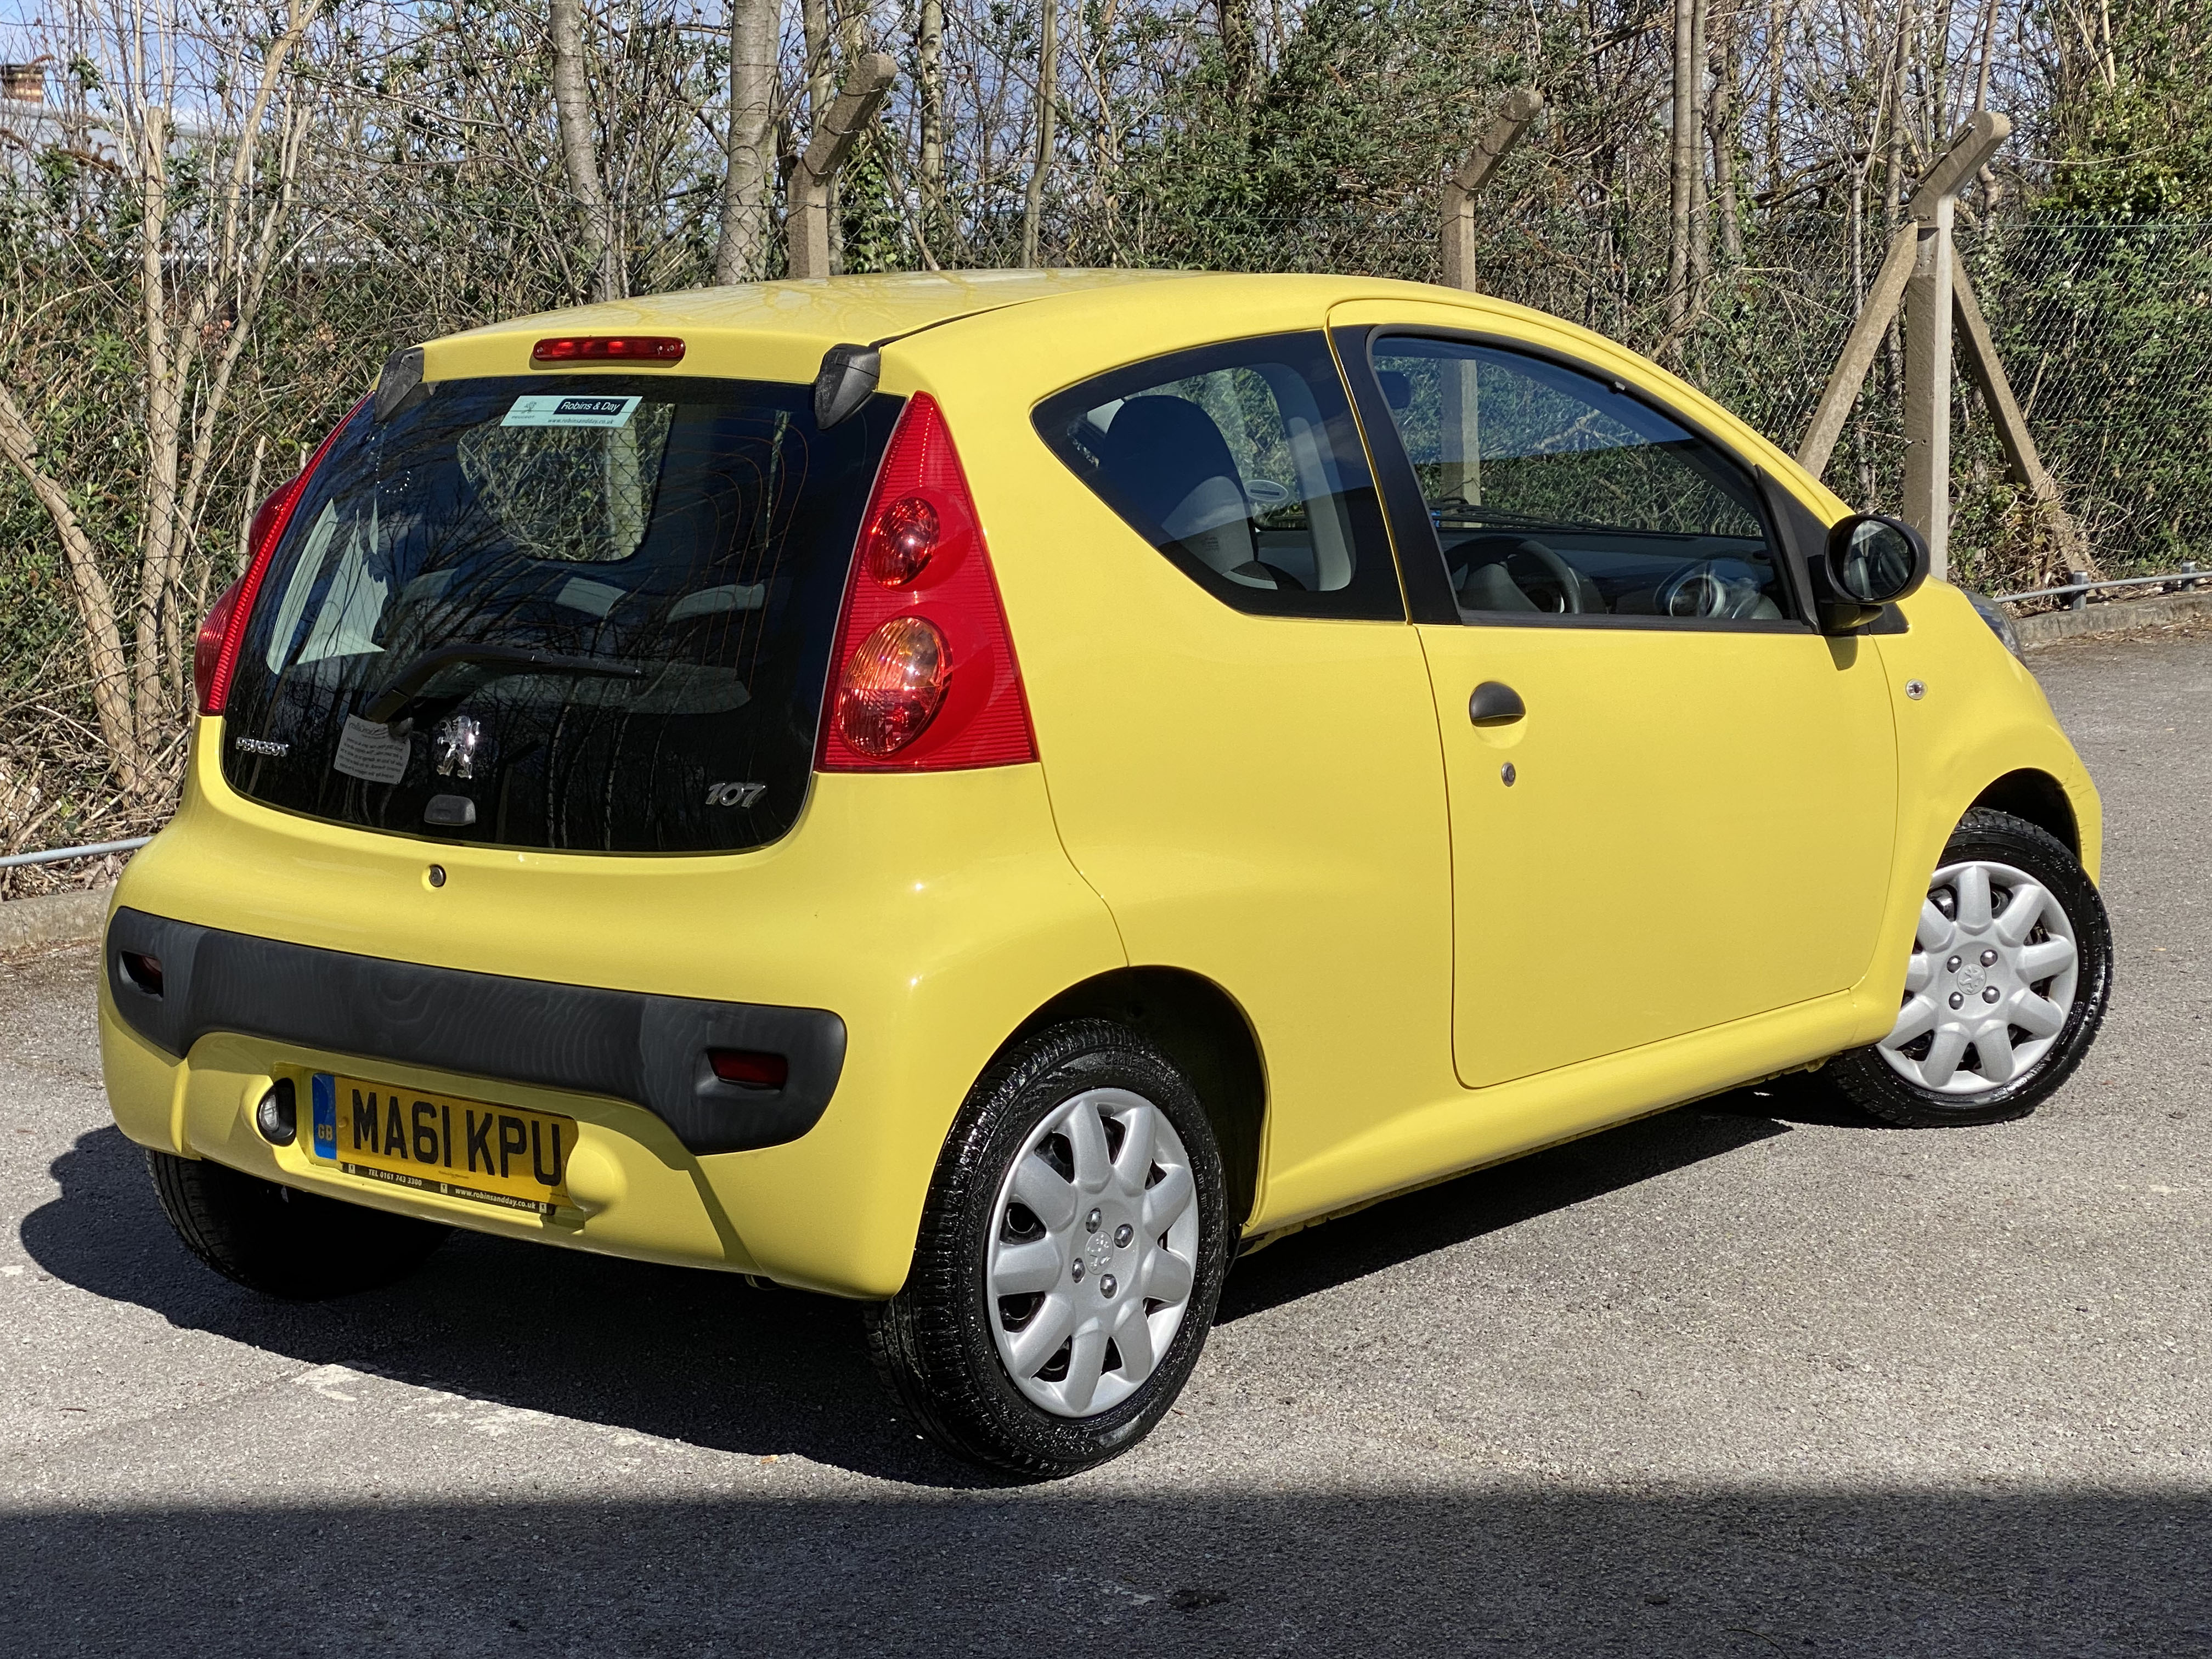 [MA61 KPU] 2011 Peugeot 107 1.0 Urban Lite 3-door hatchback in Yellow, 9,167 Miles, MOT expired - Image 2 of 7